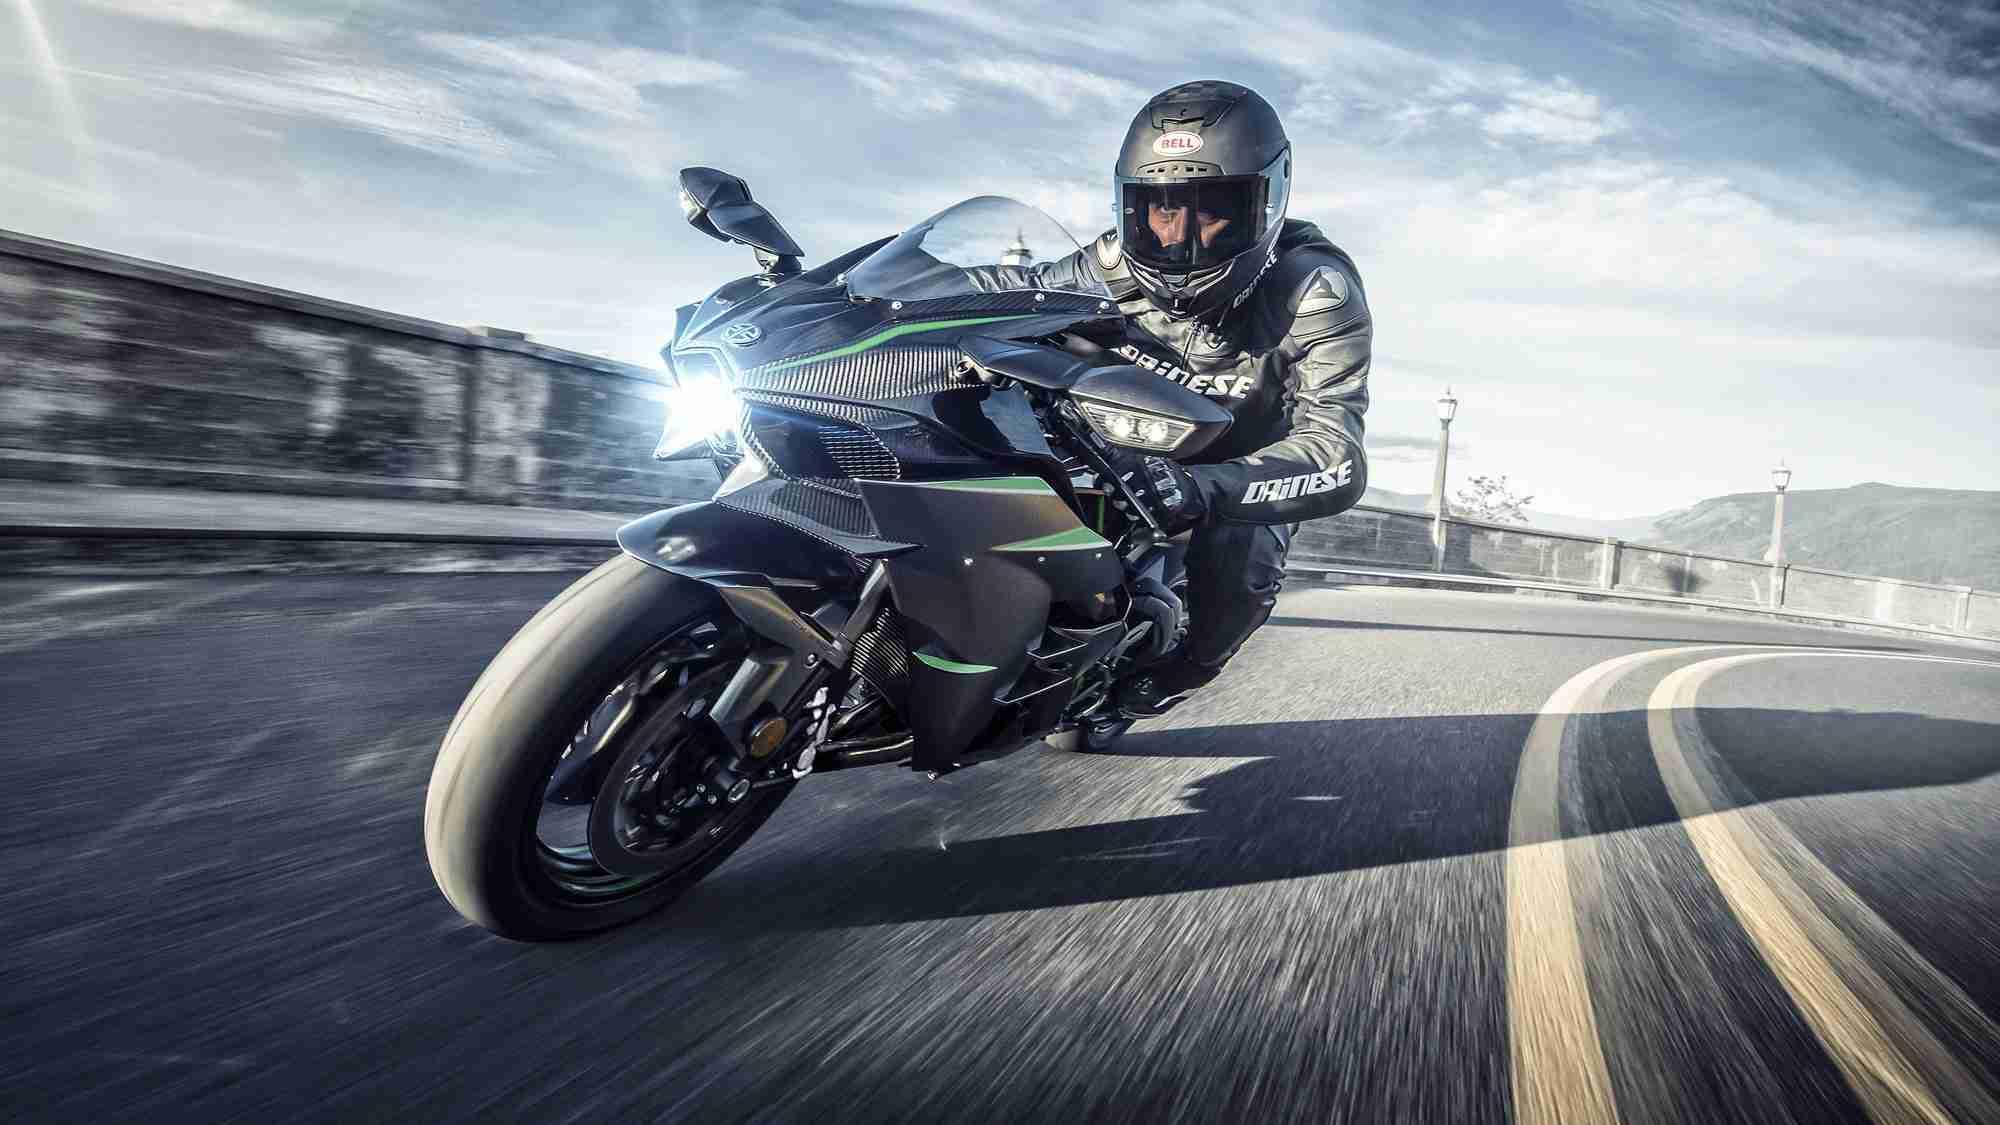 2019 Kawasaki Ninja H2 cockpit